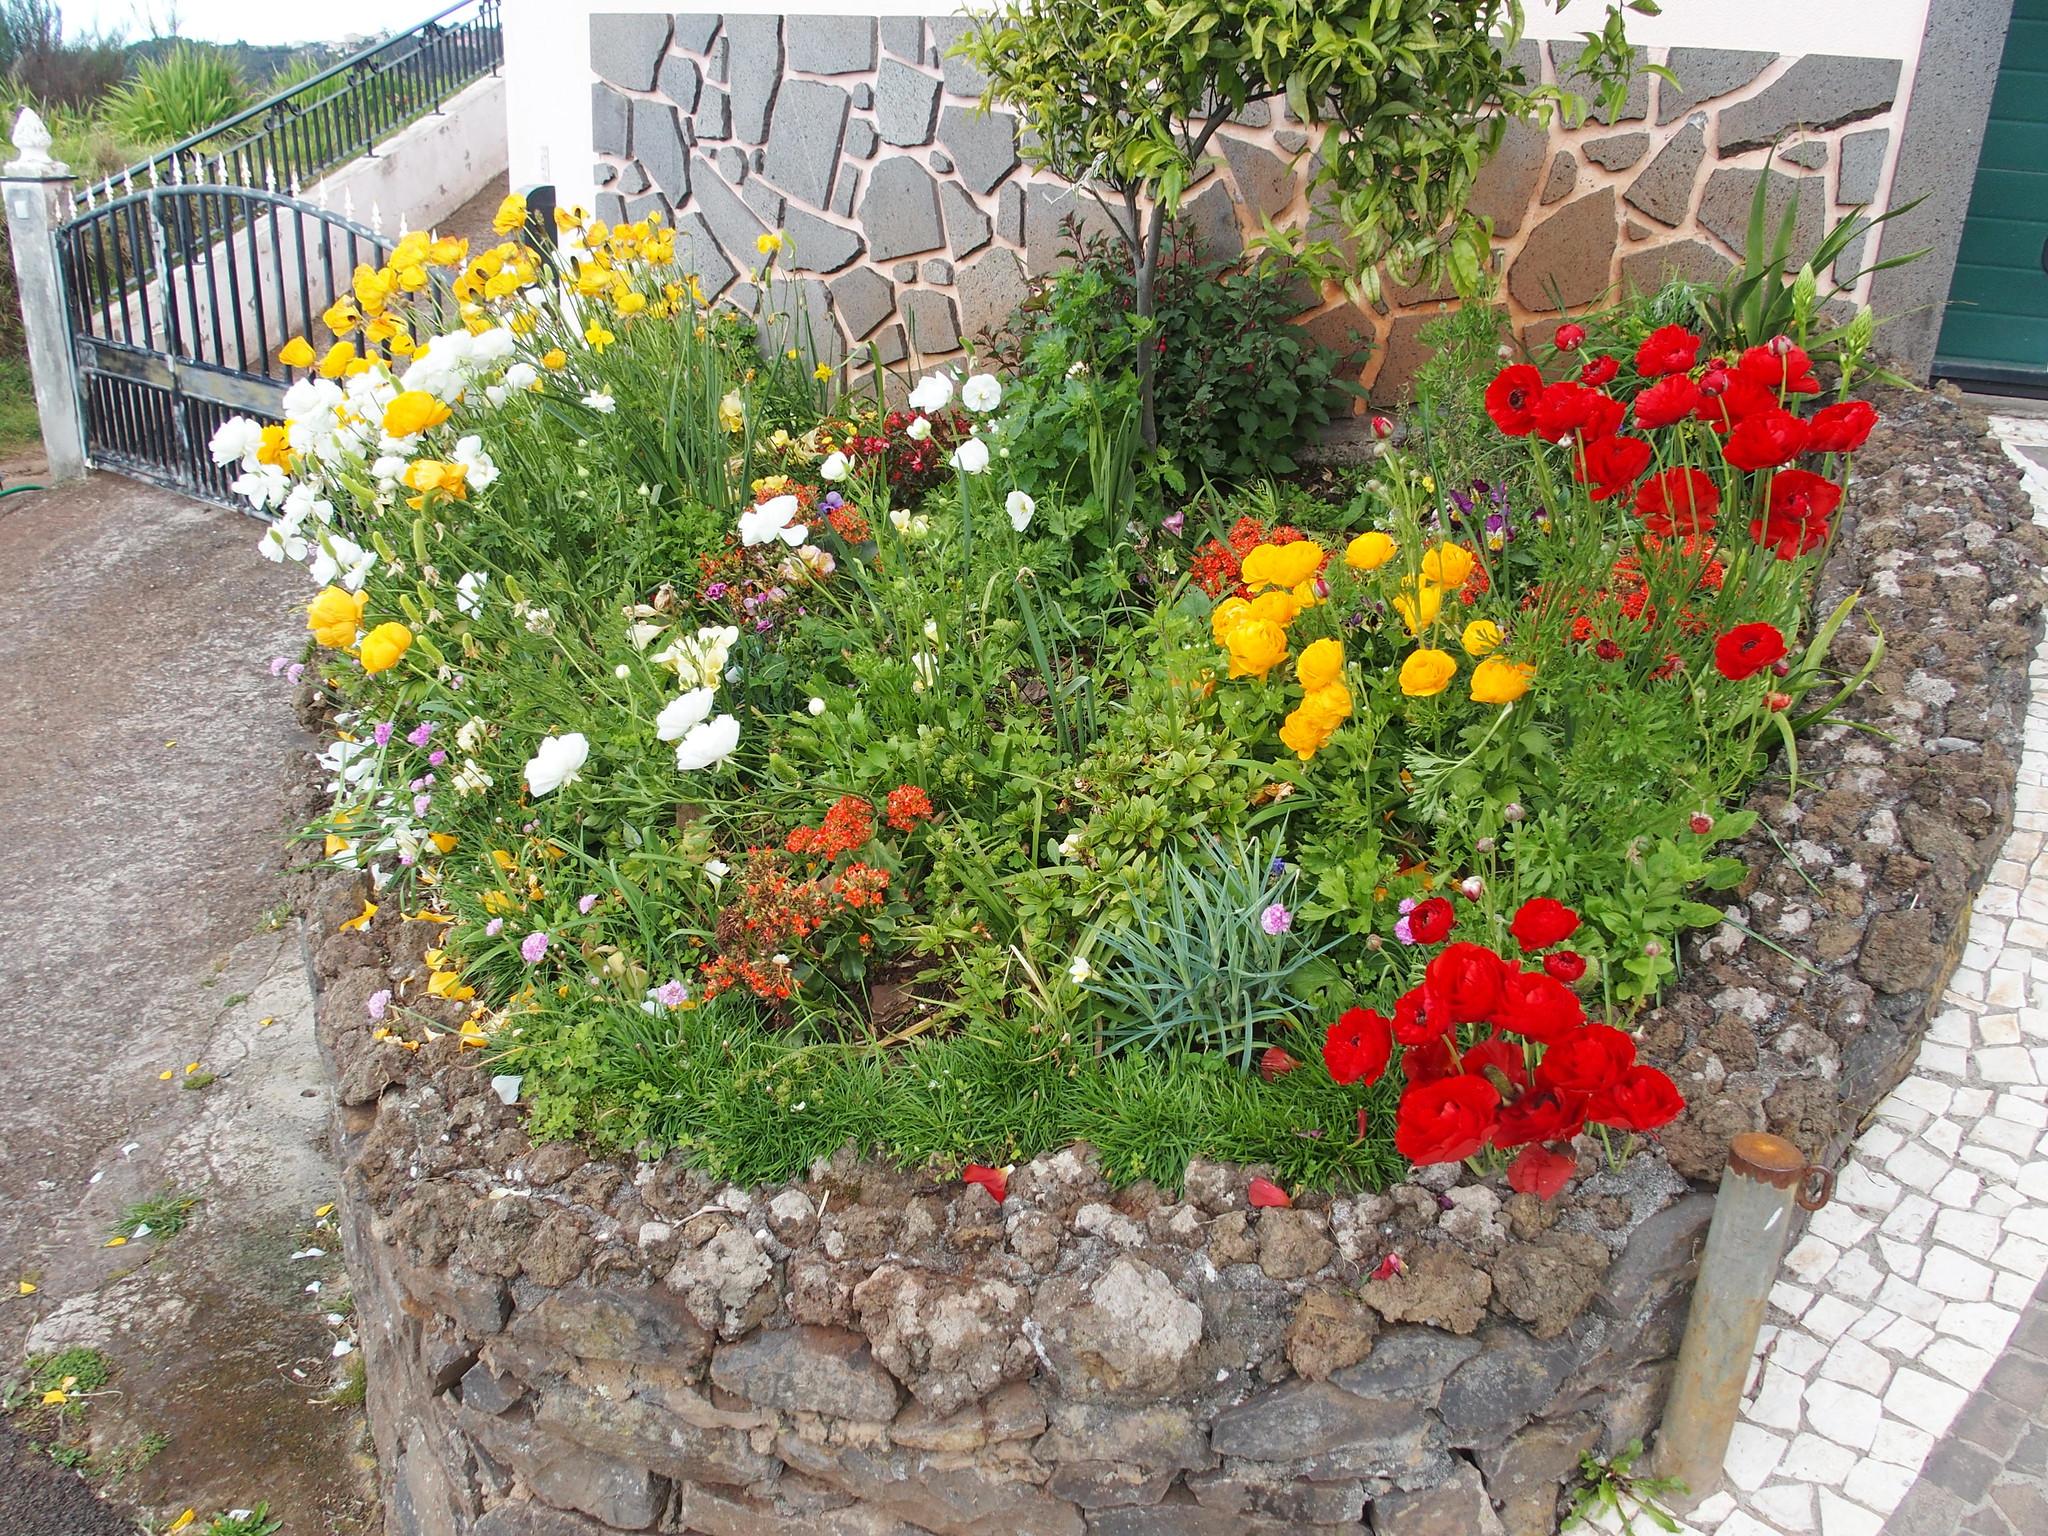 Lokal trädgård